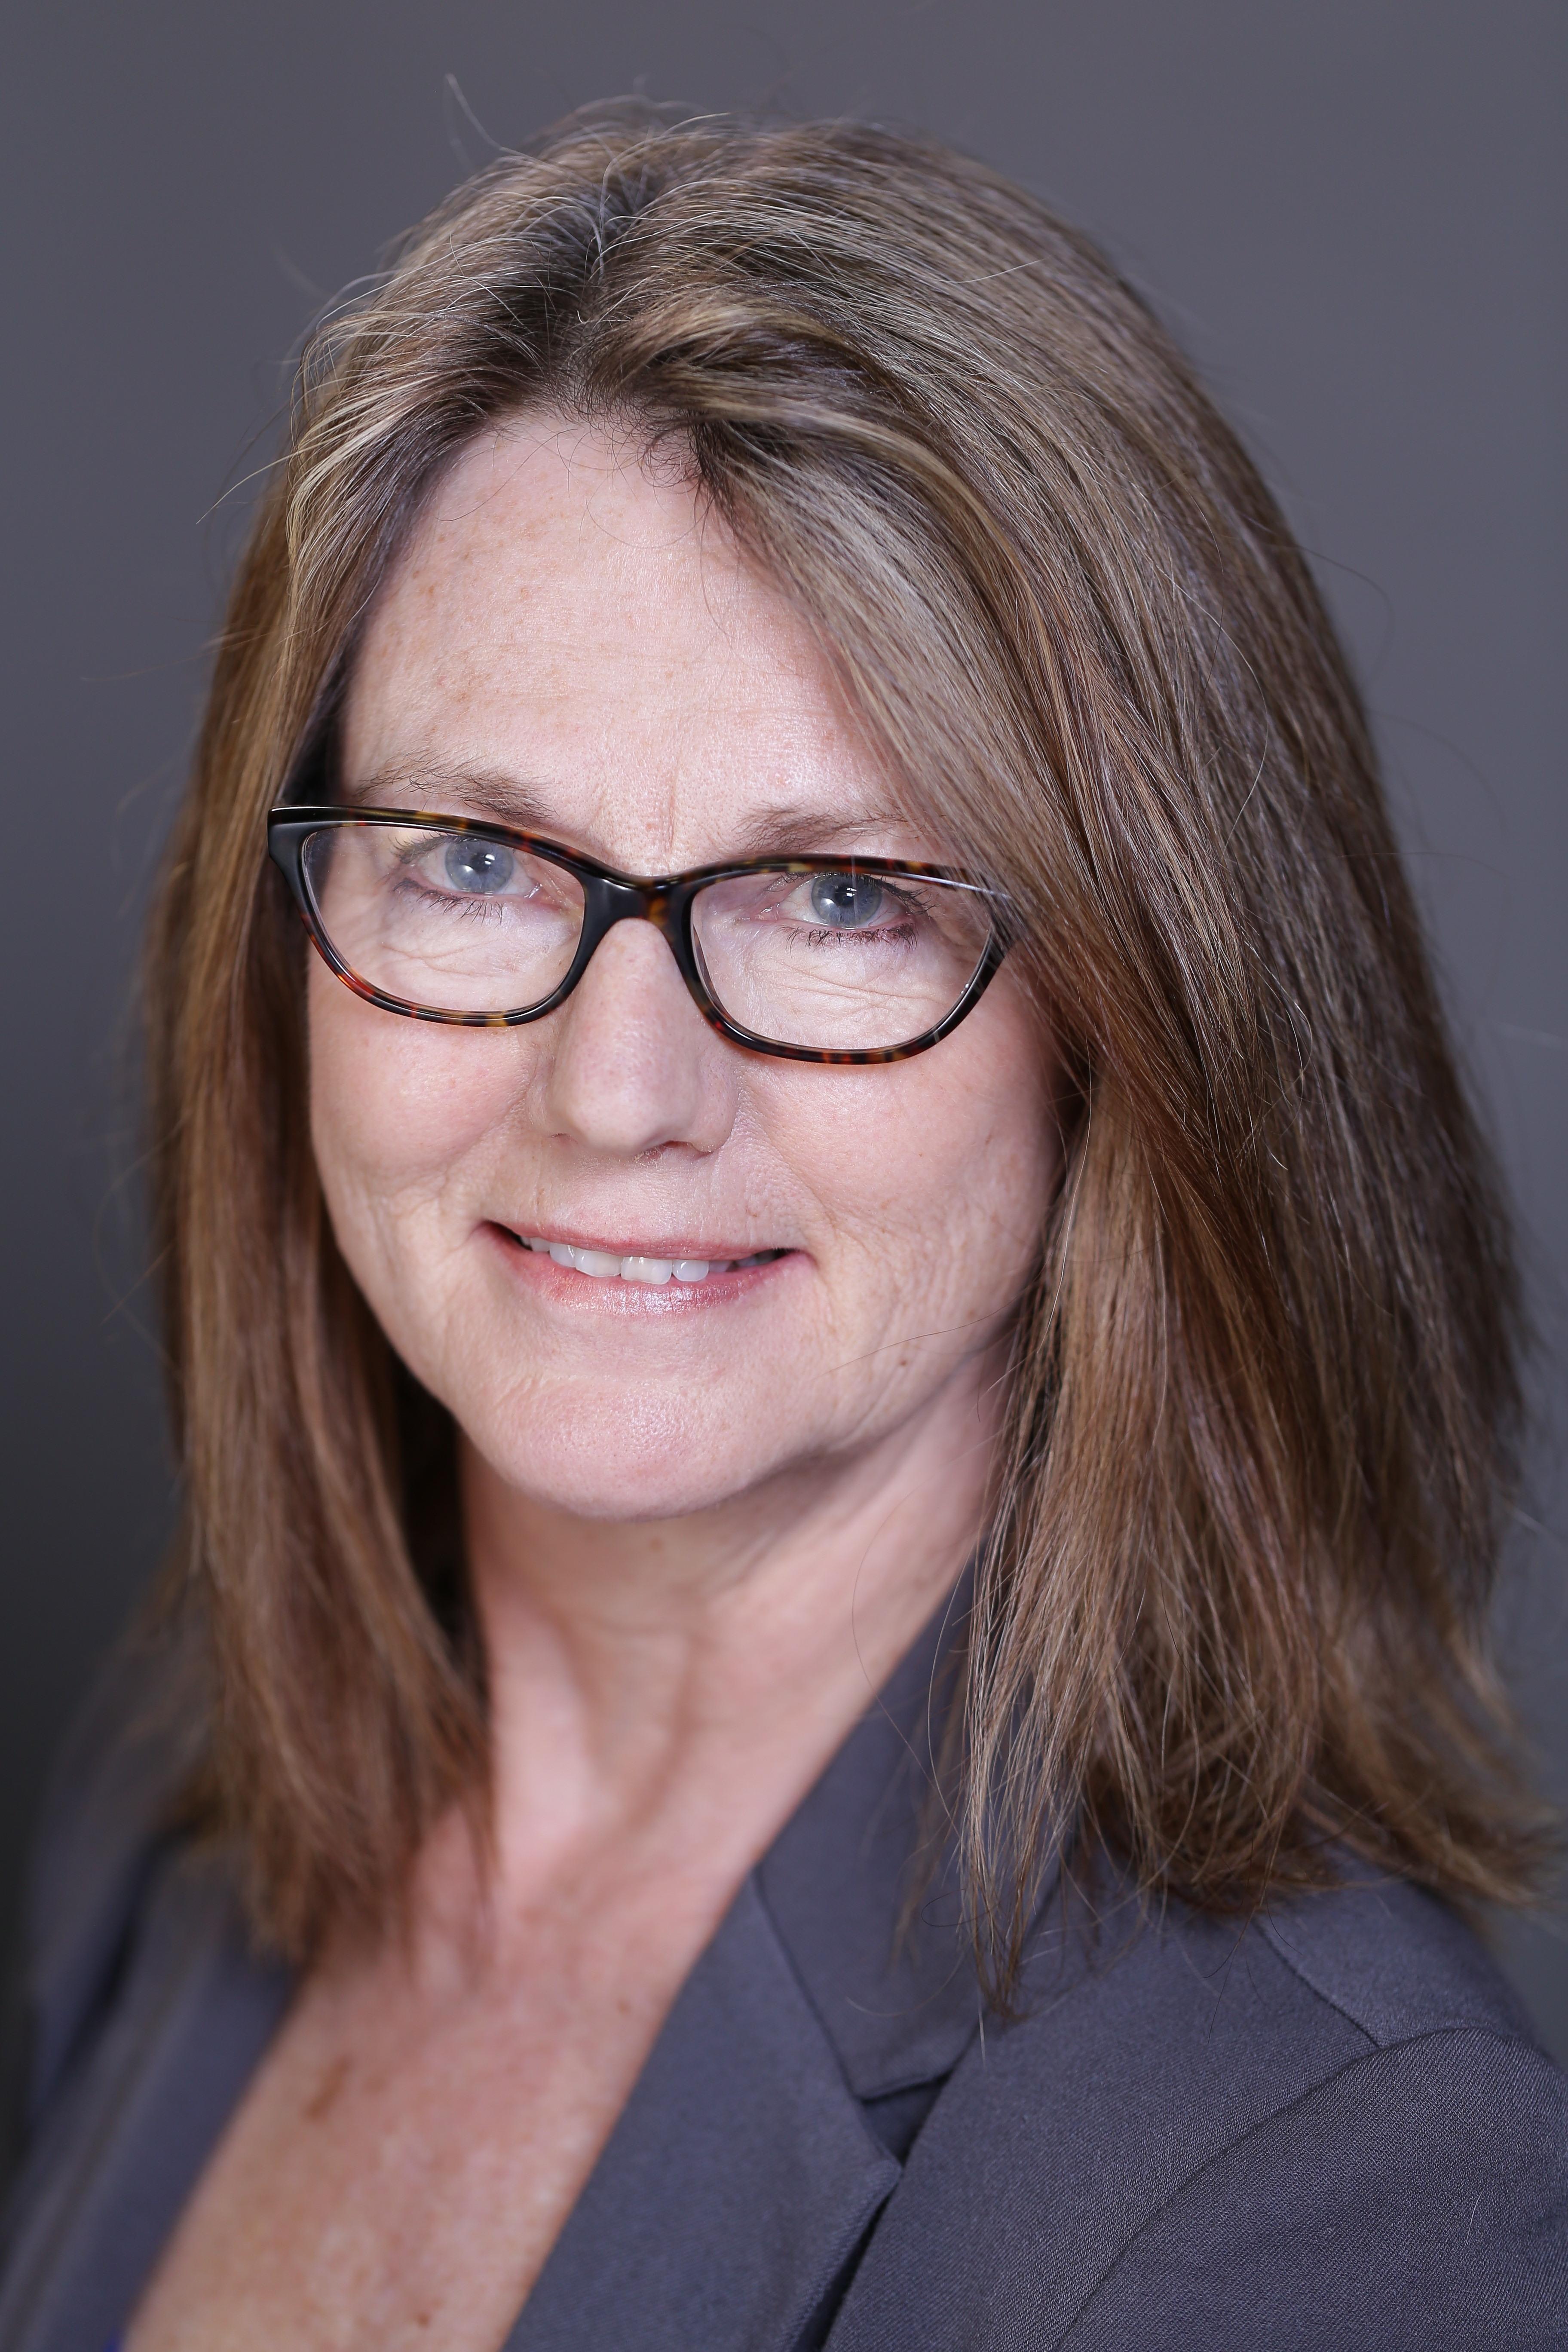 Profile picture of Mavourneen Varcoe-Ryan